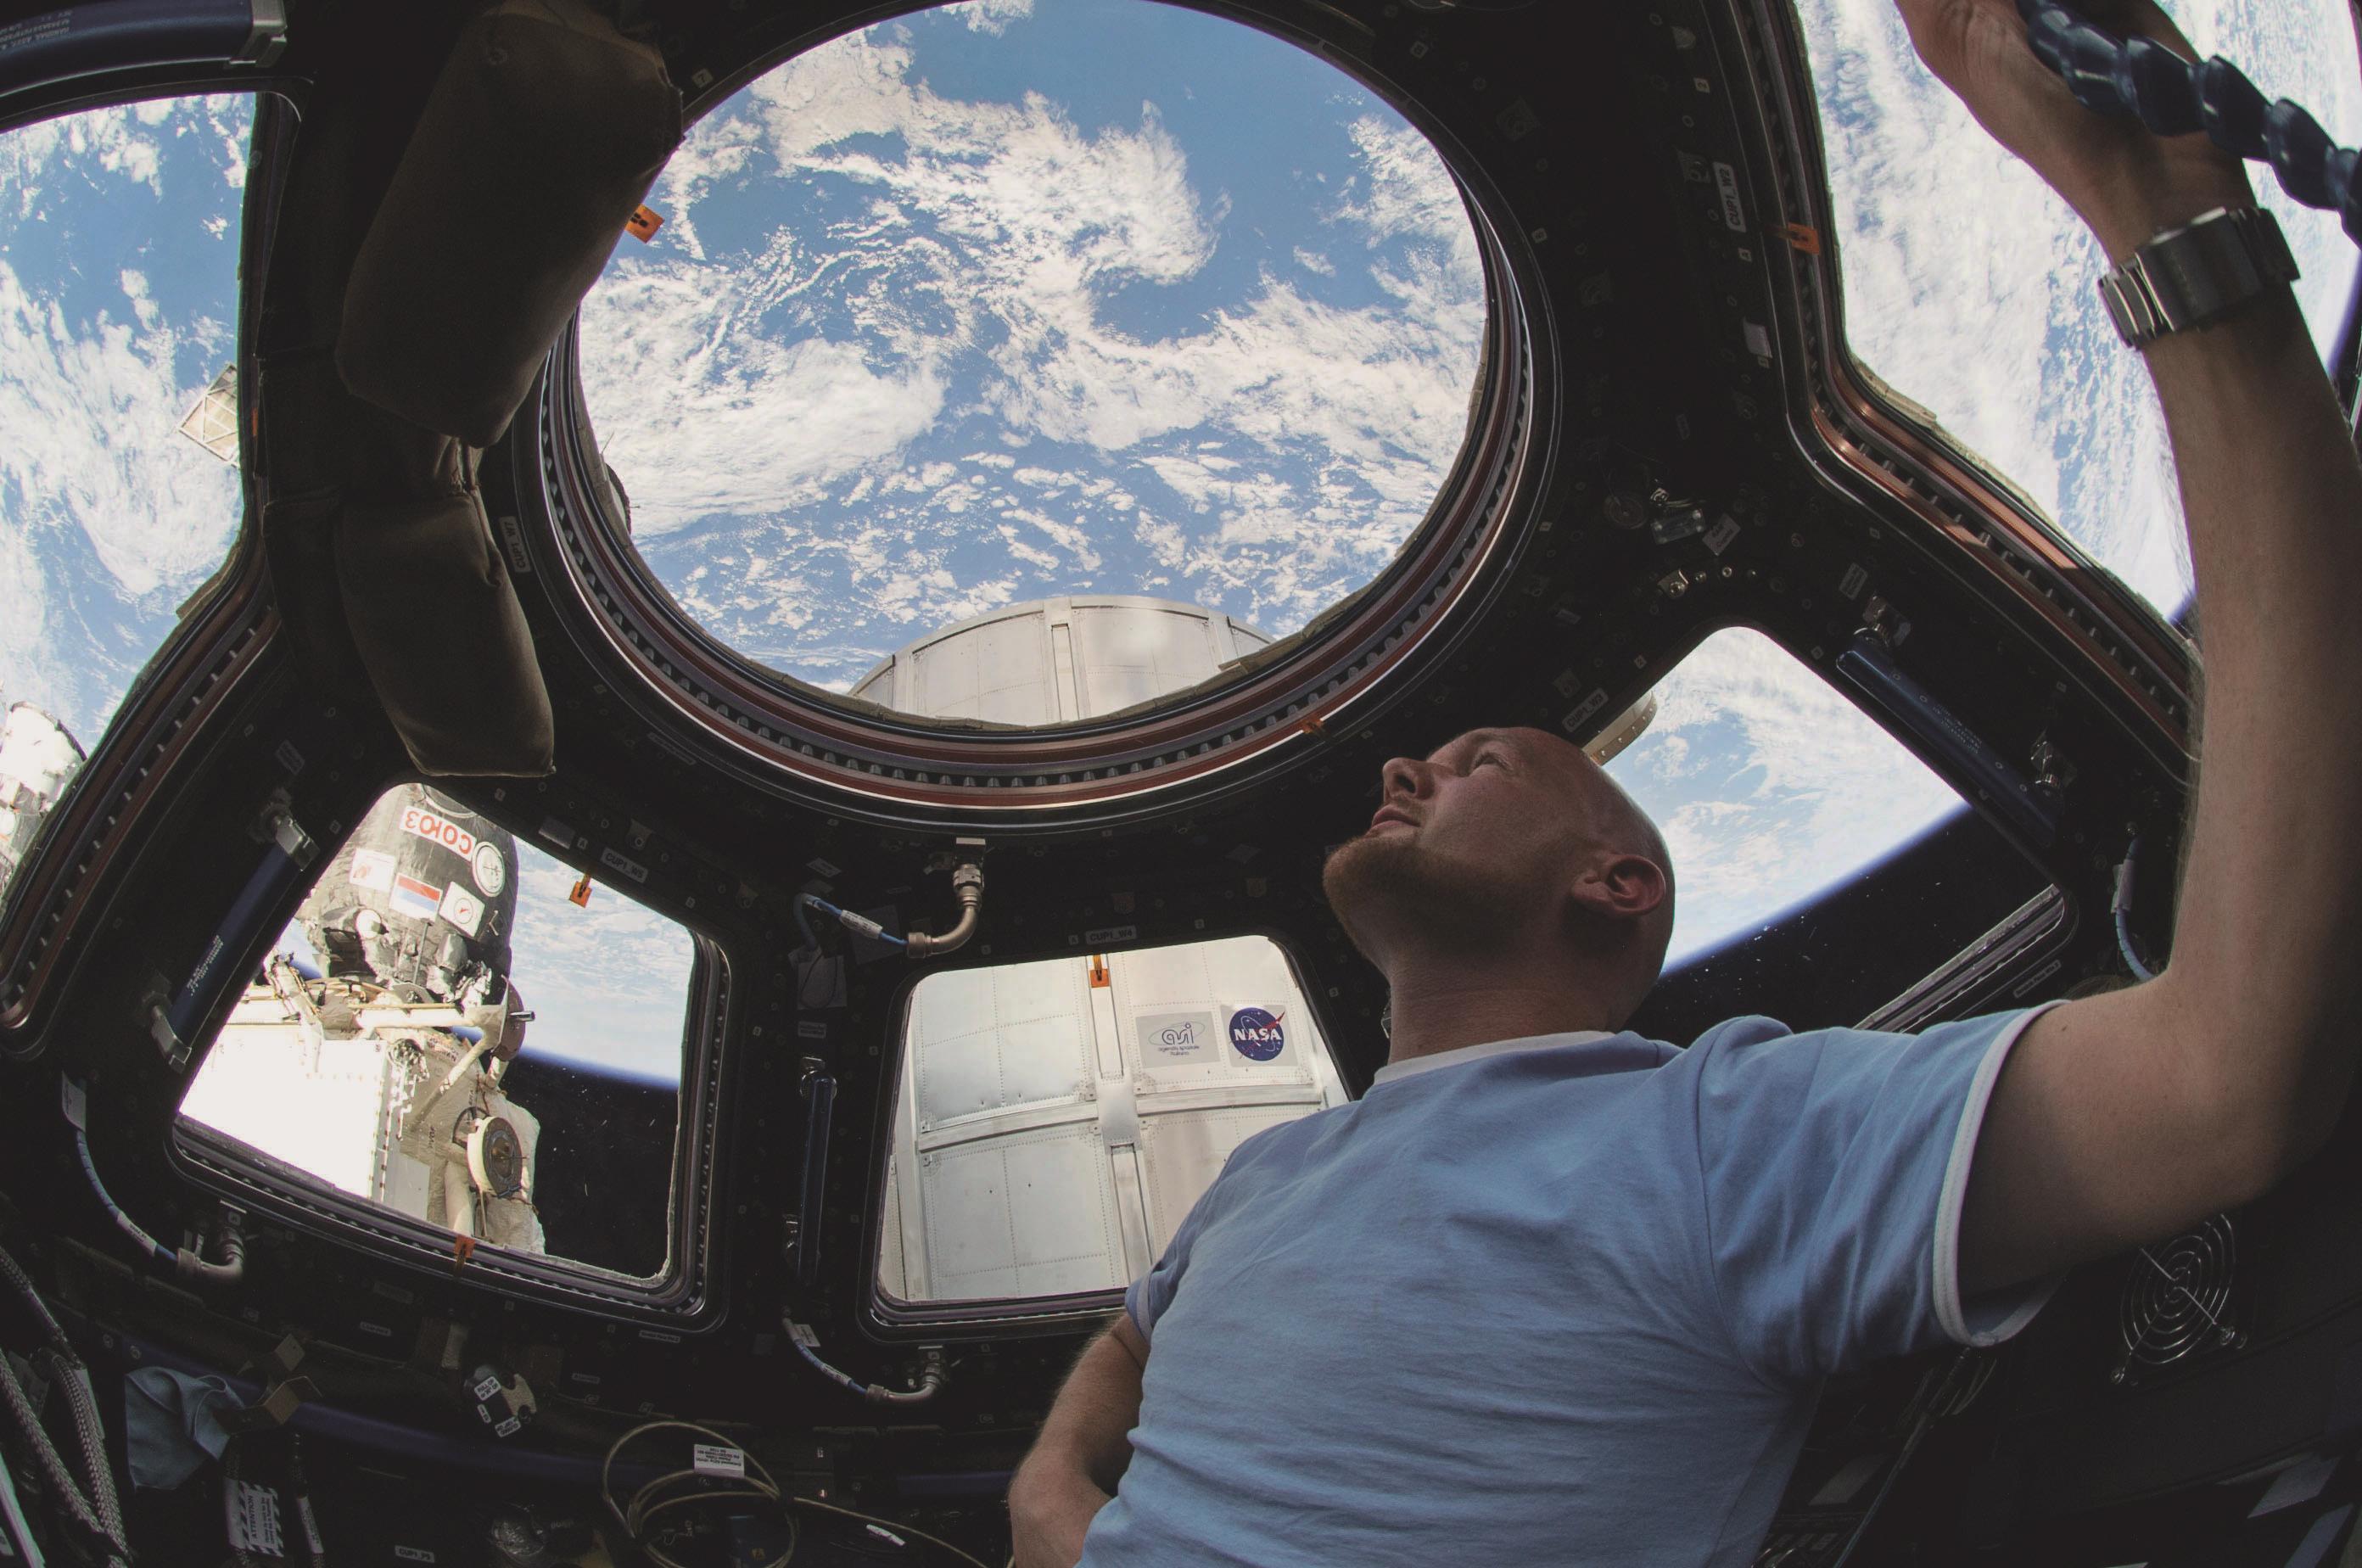 Bilddatei: Alexander-Gerst(C)NASA,ESA.jpg